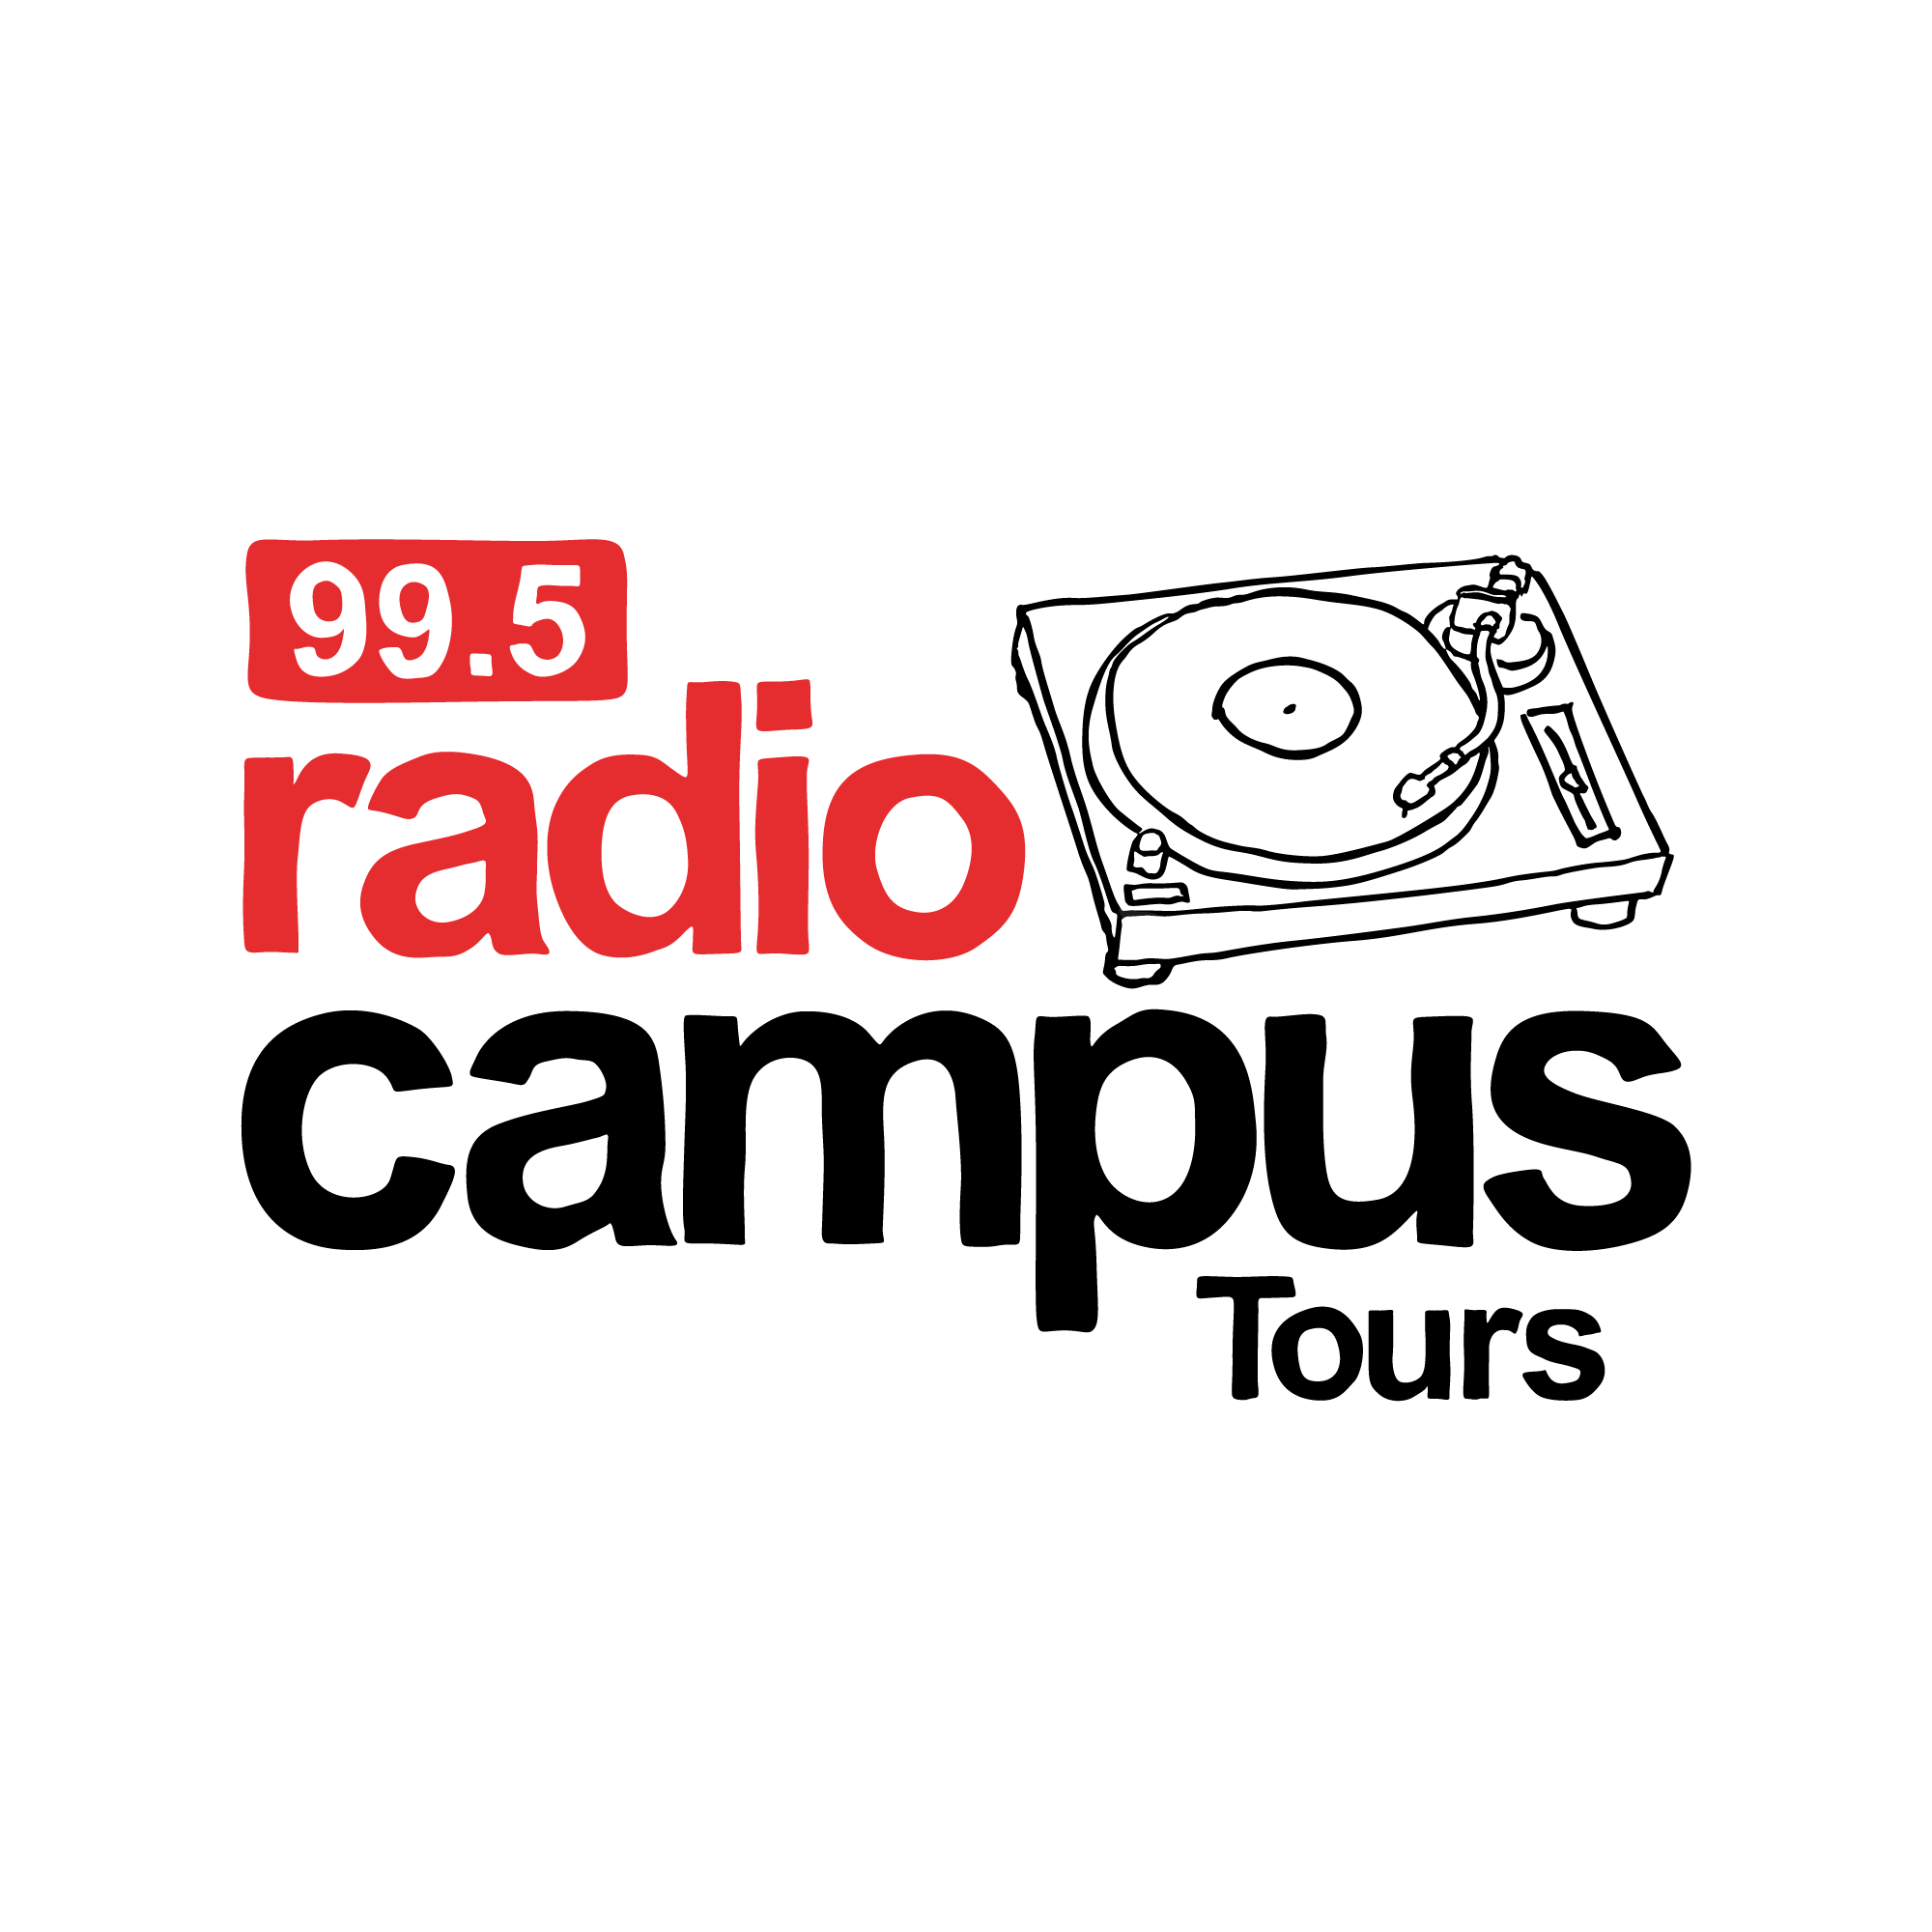 B0Ombox #1 | Misuri - Radio Campus Tours - 99.5 FM